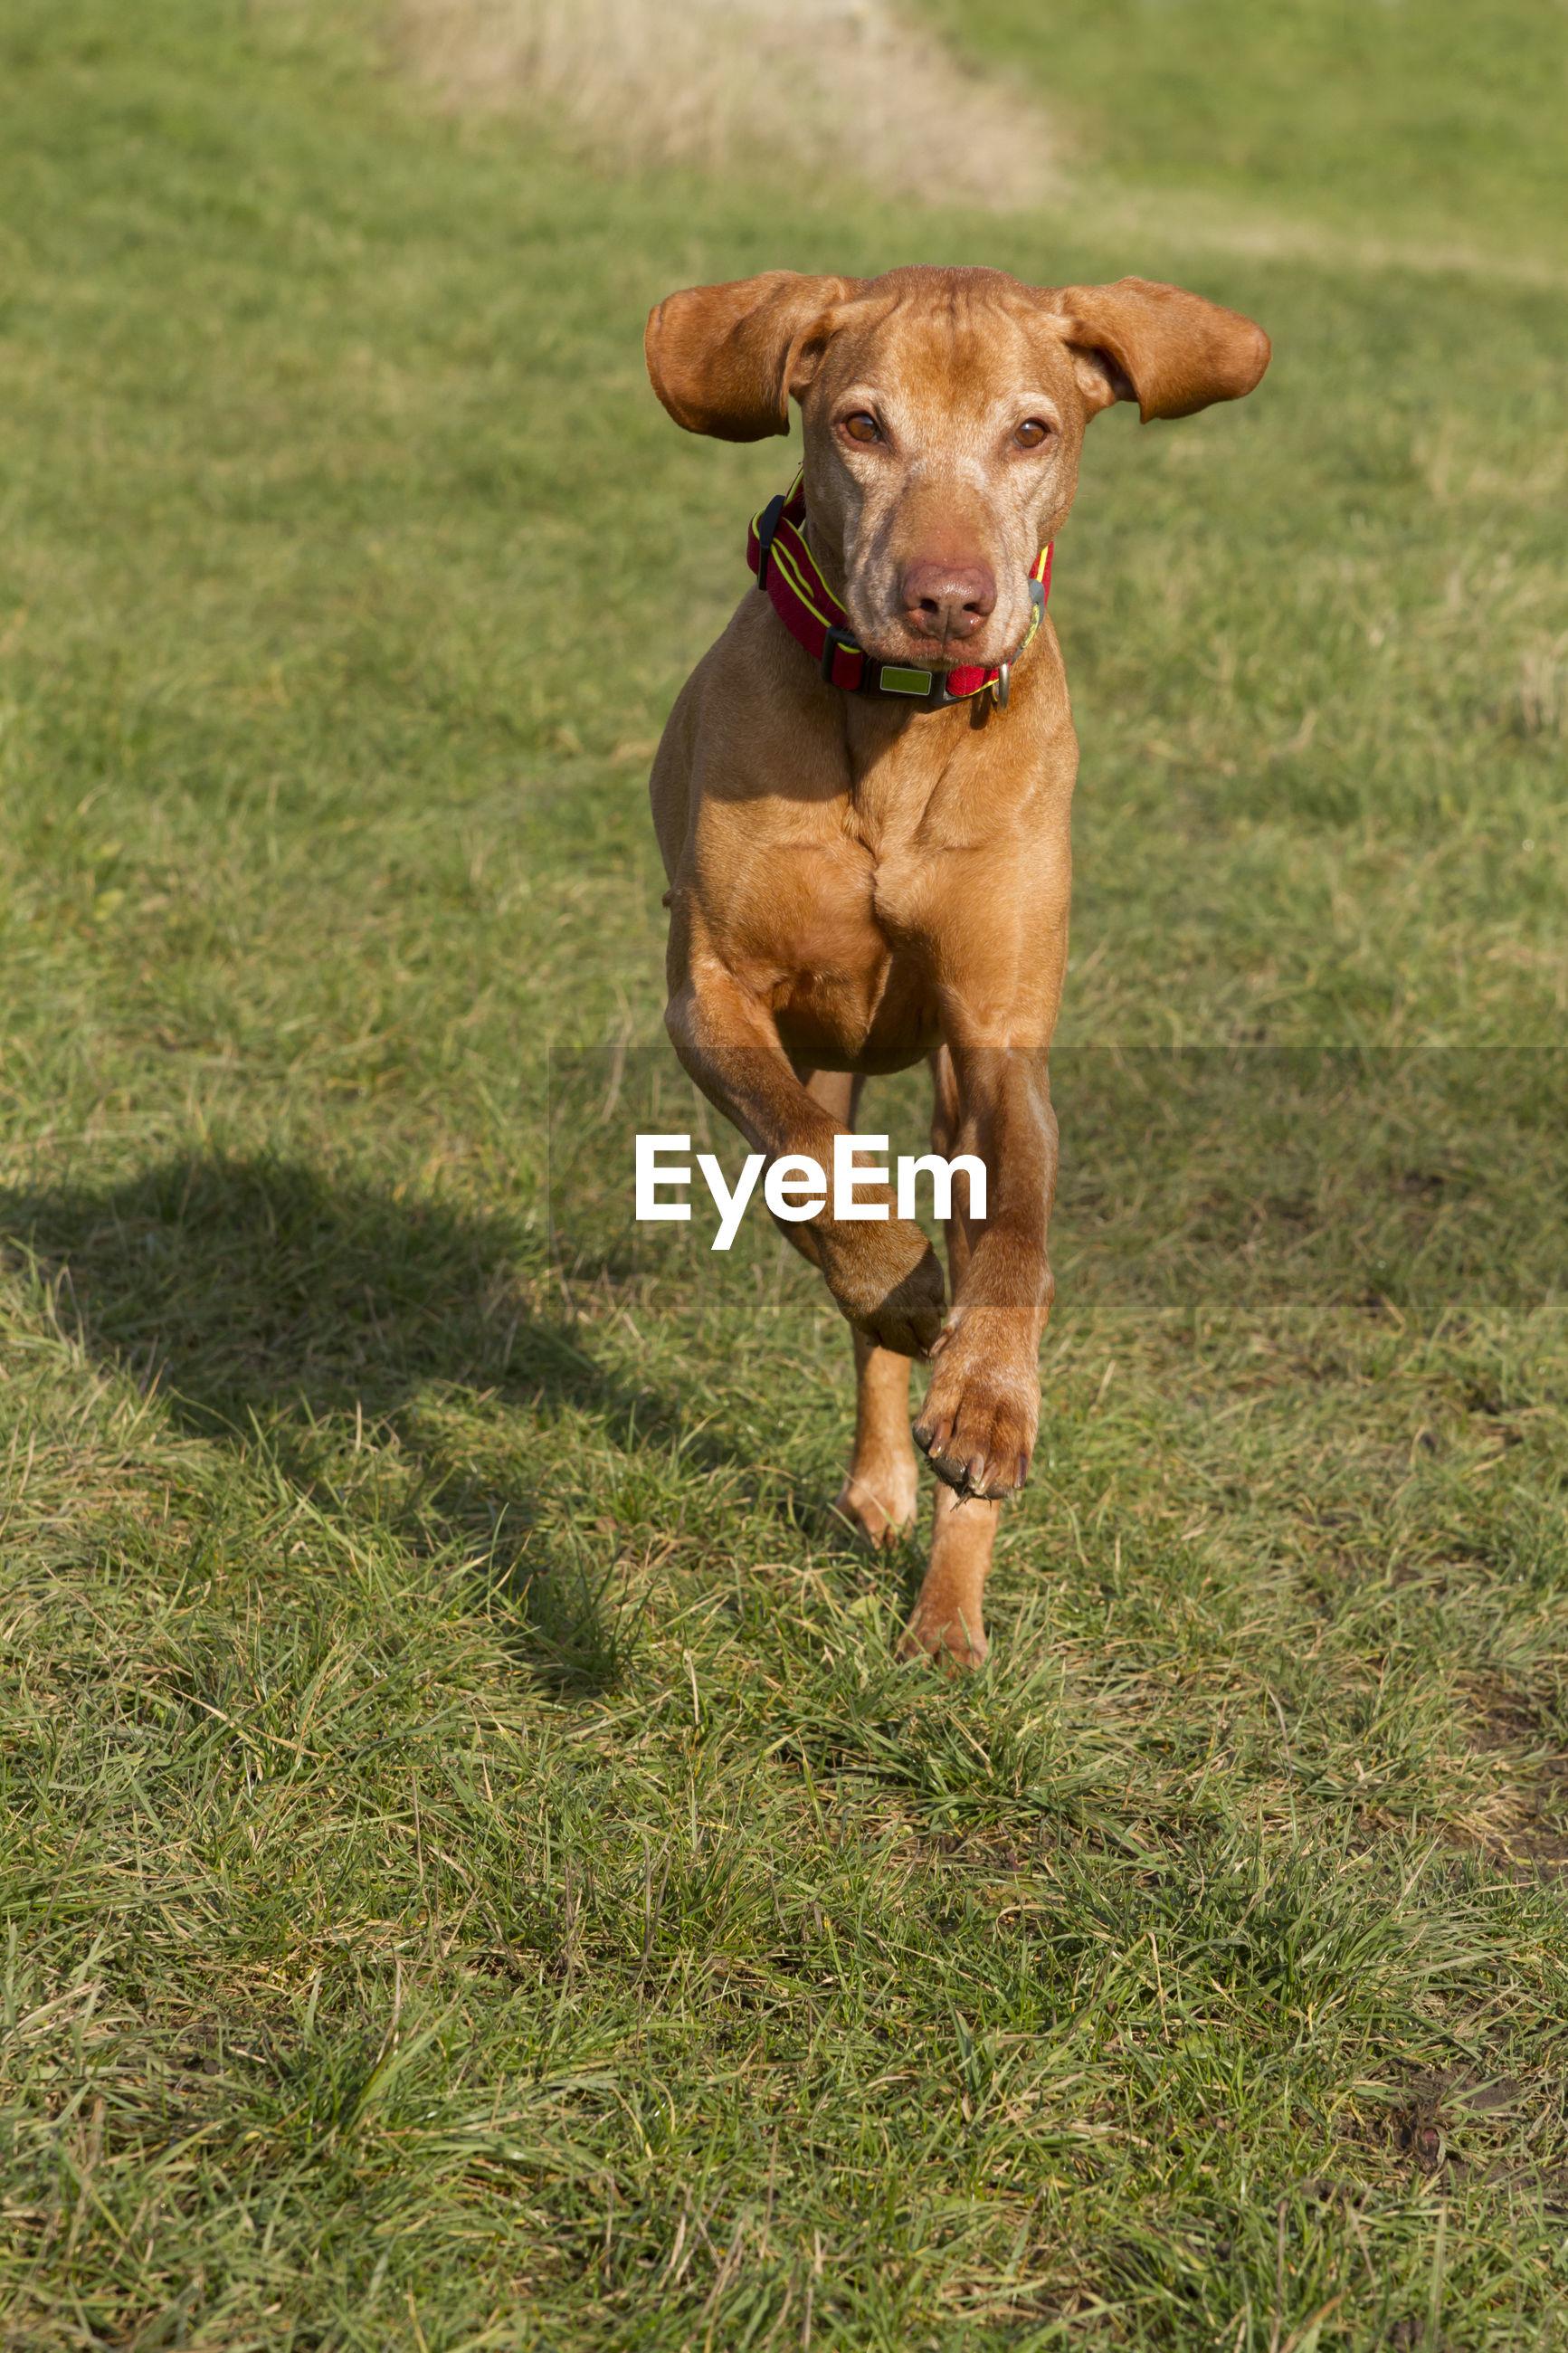 Active dog magyar vizsla running in a meadow